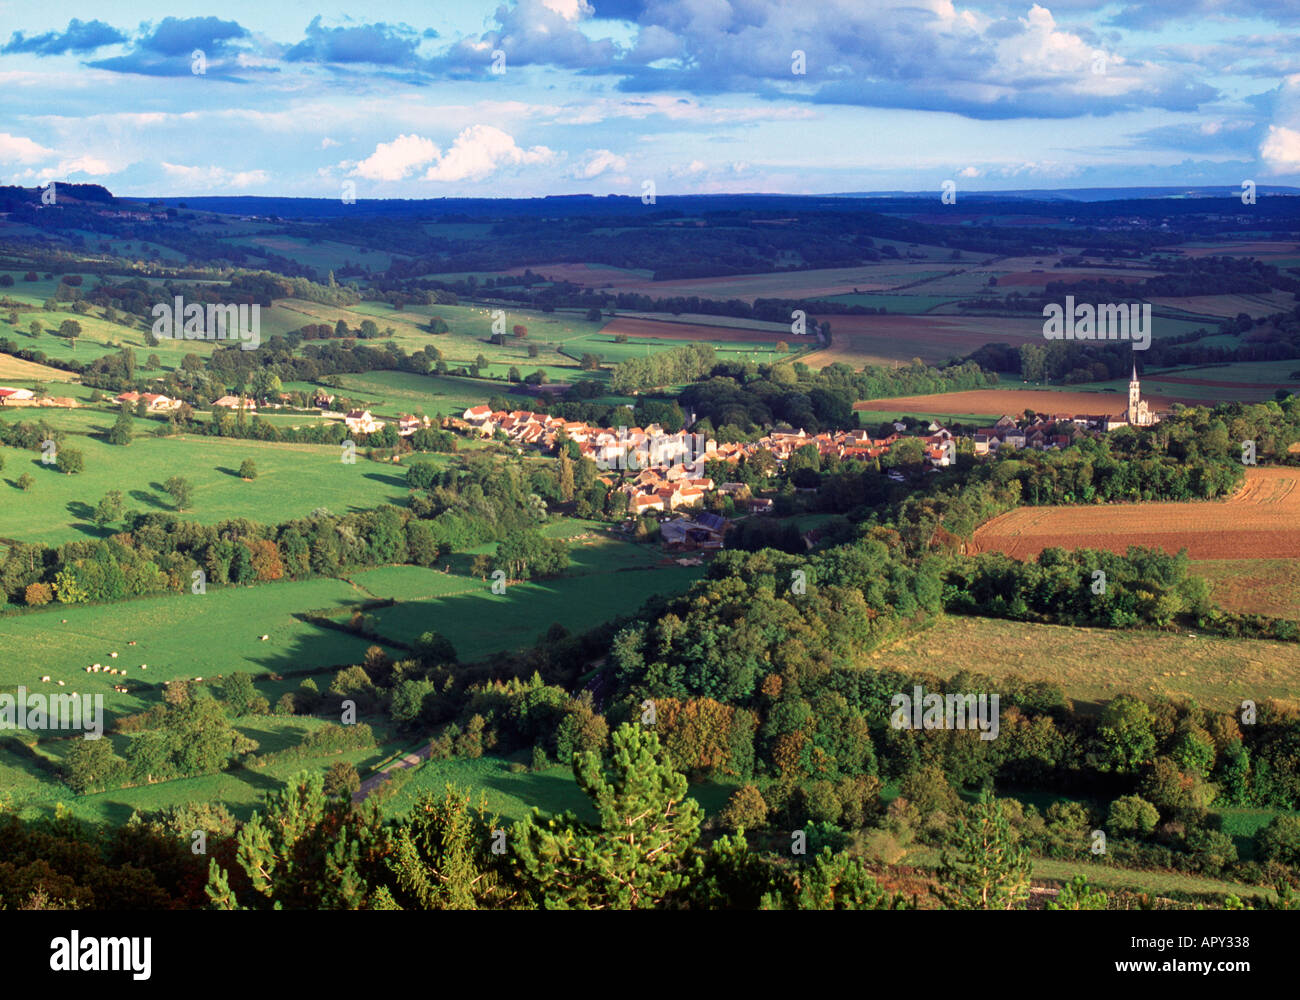 St. Pere, Chablis, Burgundy, France - Stock Image